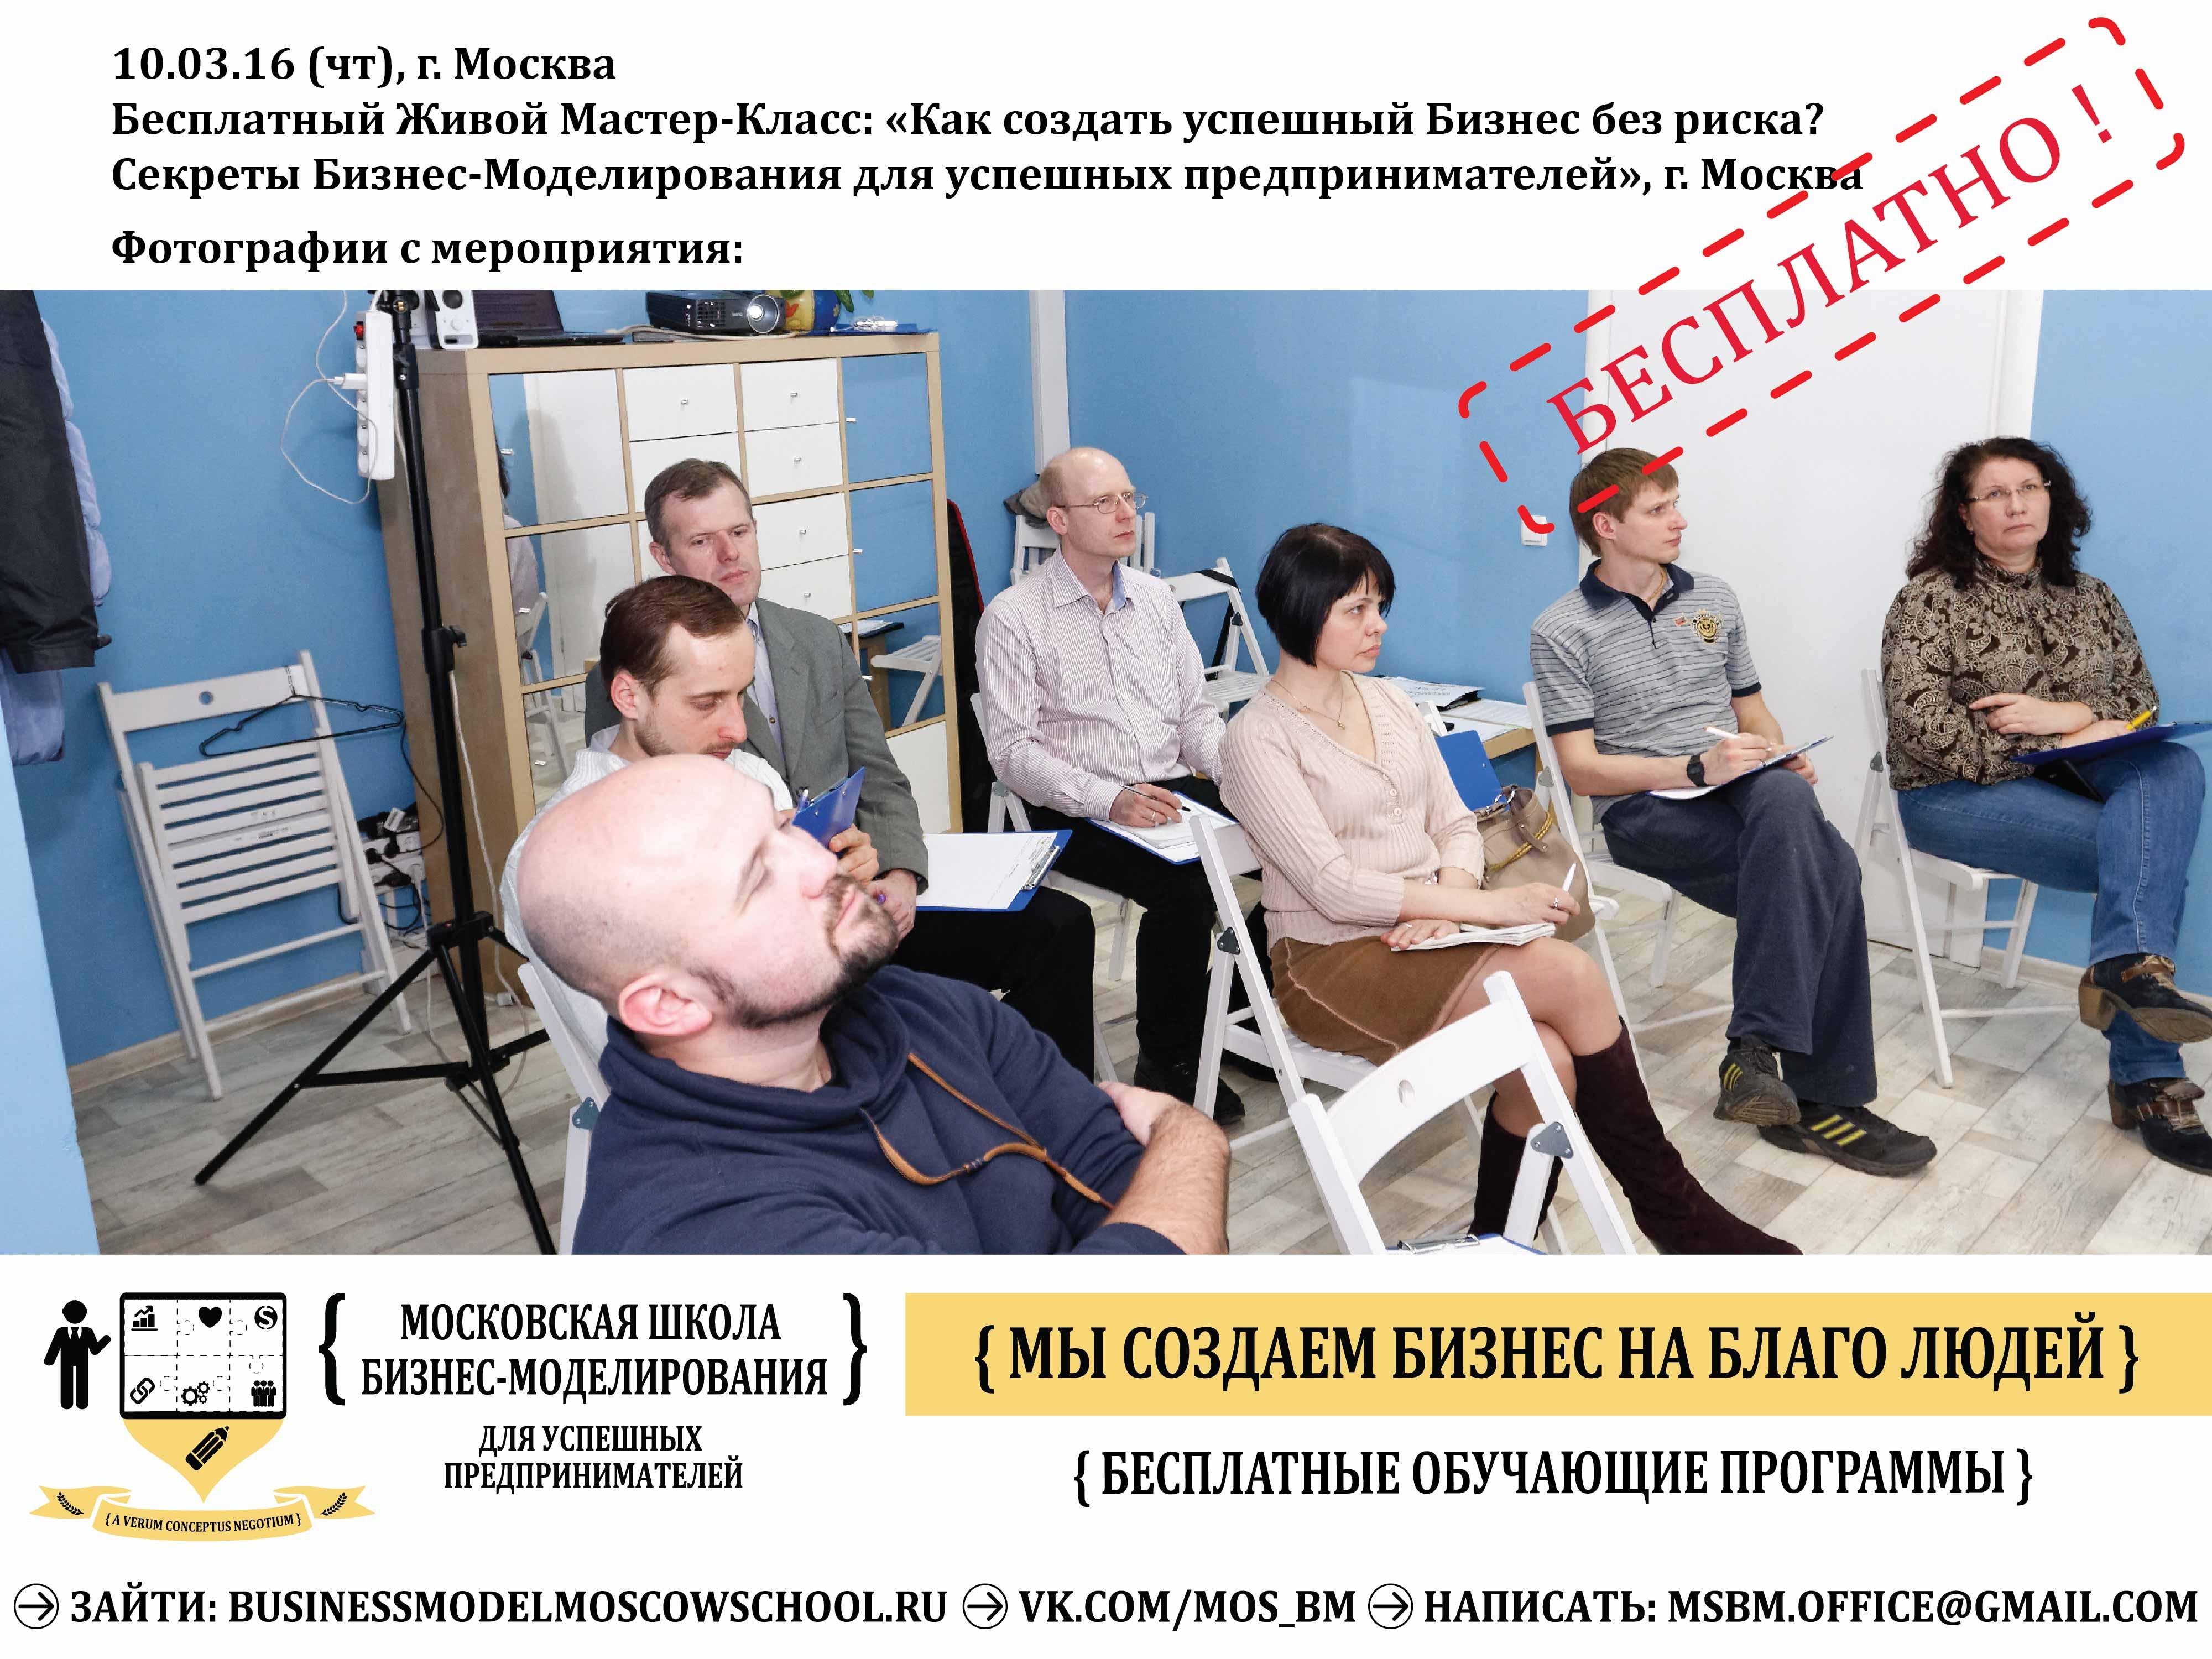 business_model_moscow_school_mclass_photo_10.03.16-1